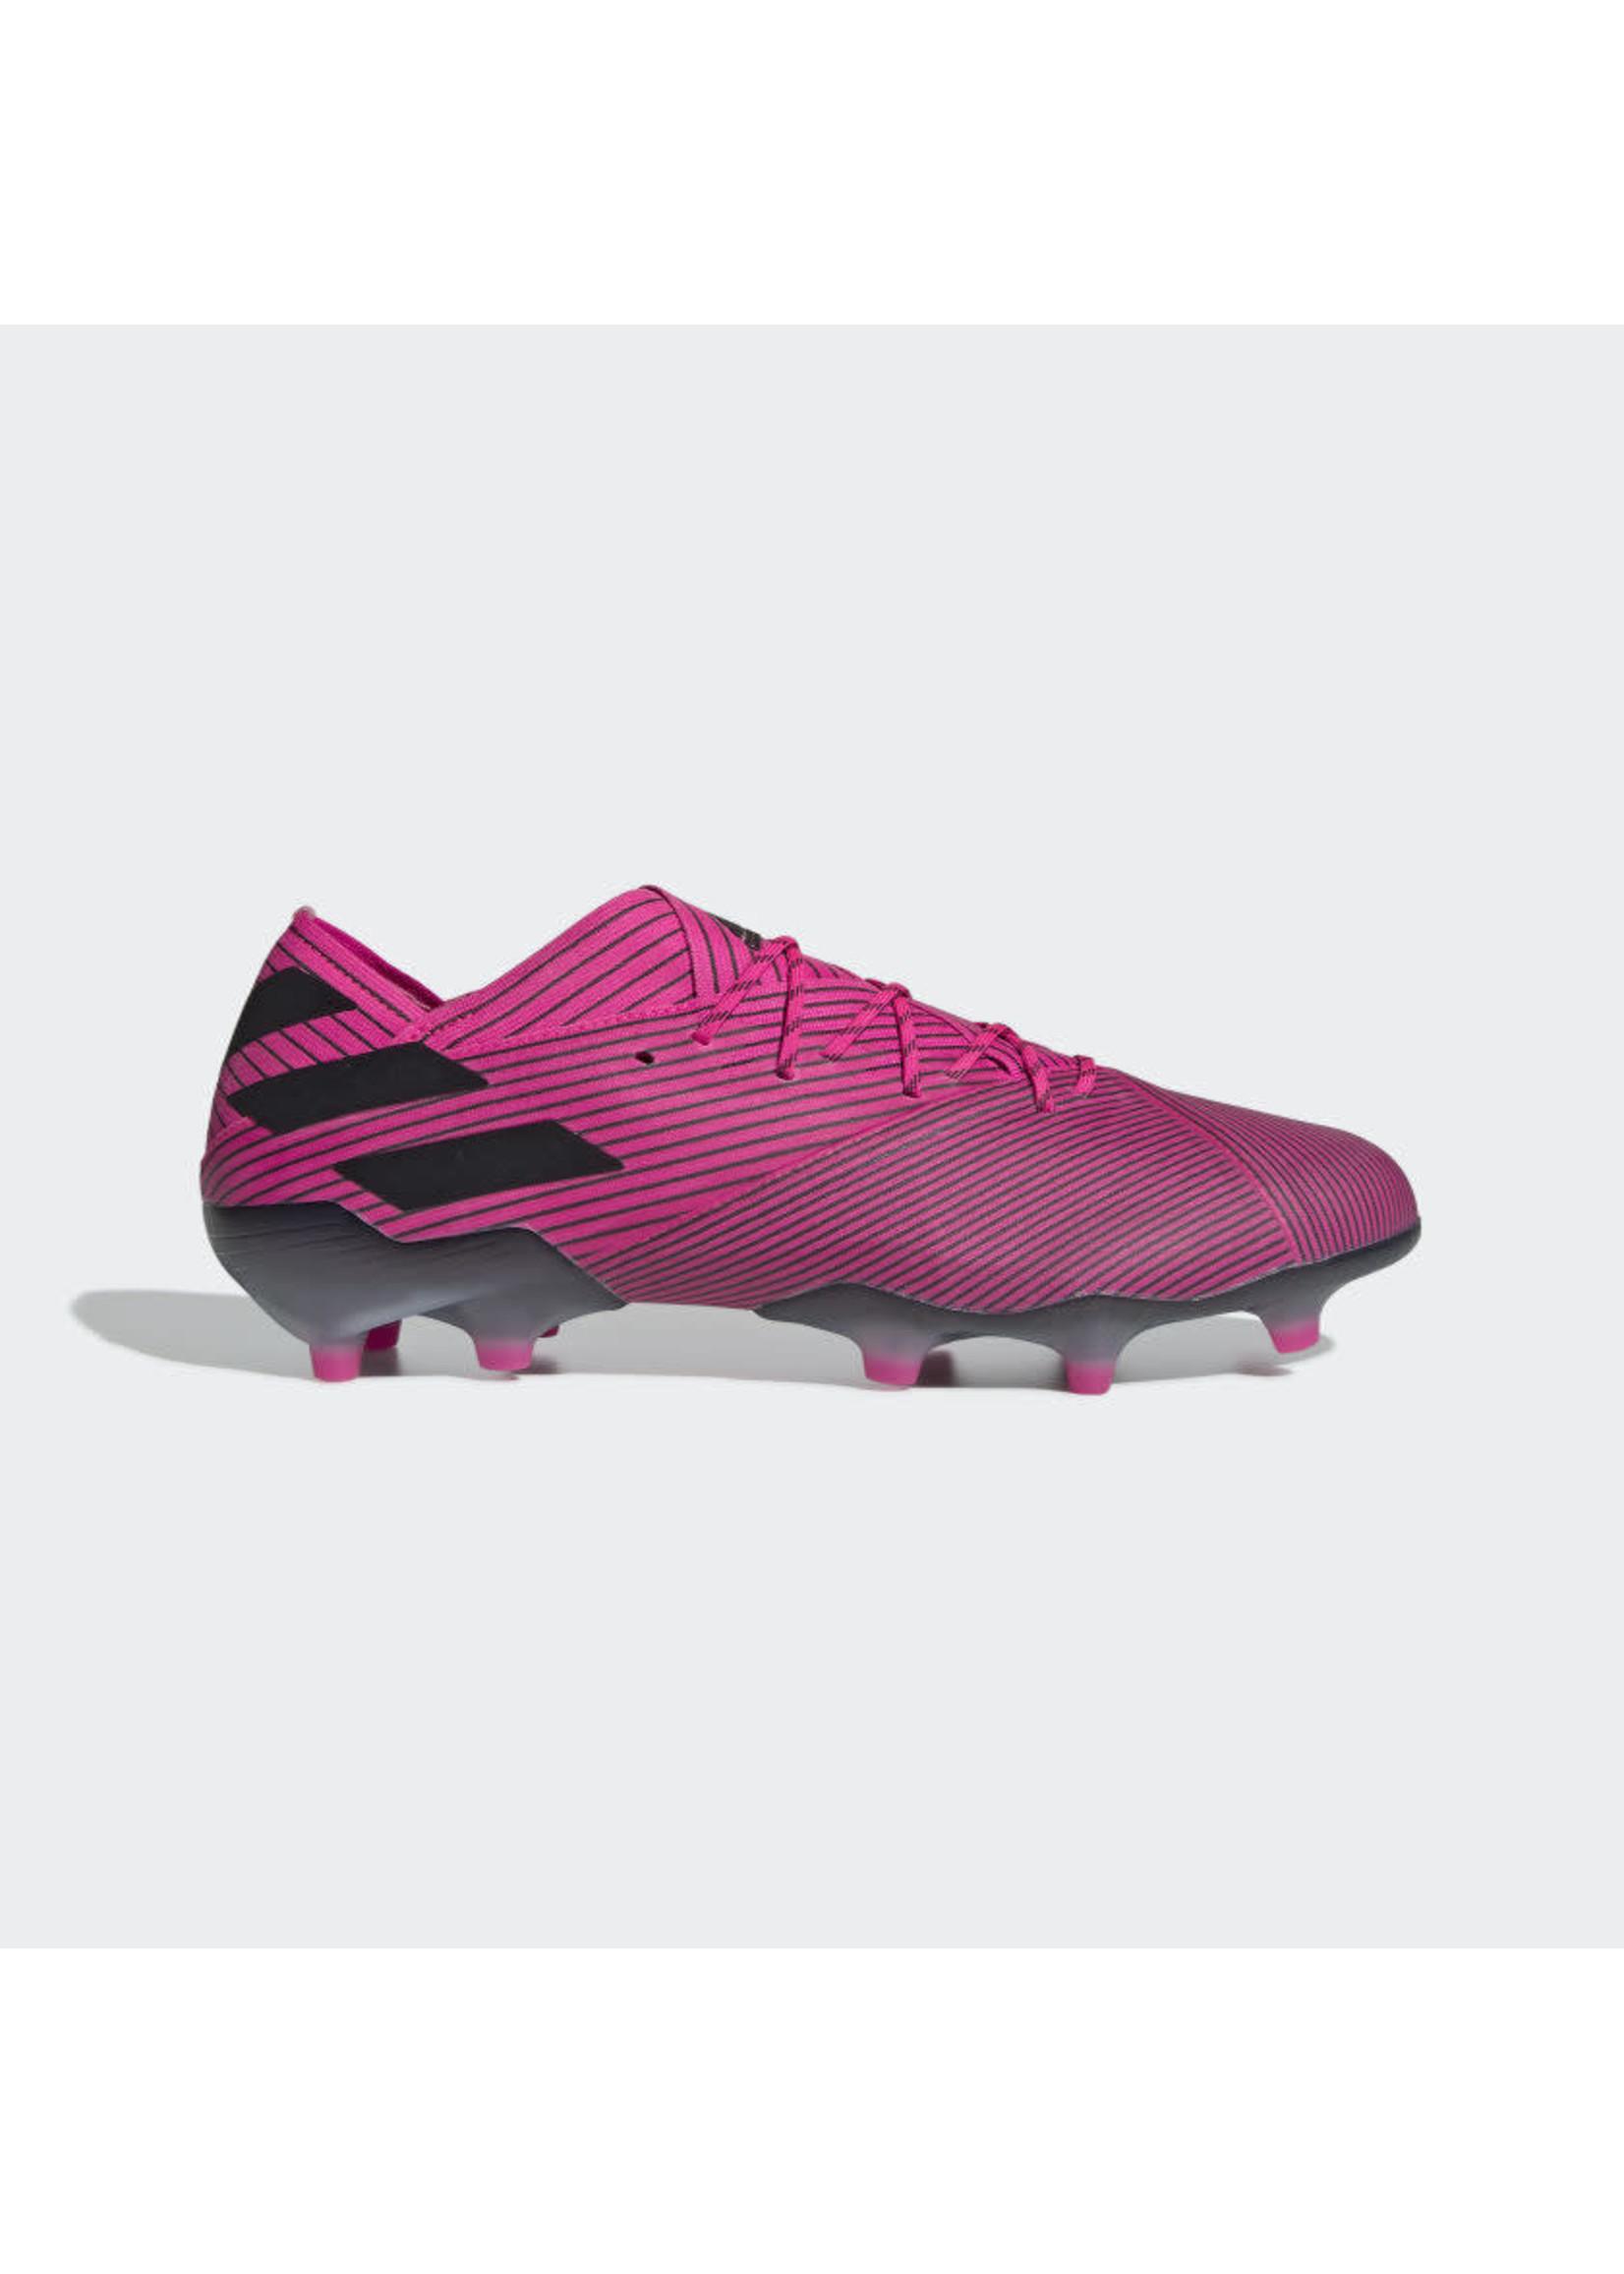 Adidas Nemeziz 19.1 FG - Pink/Black